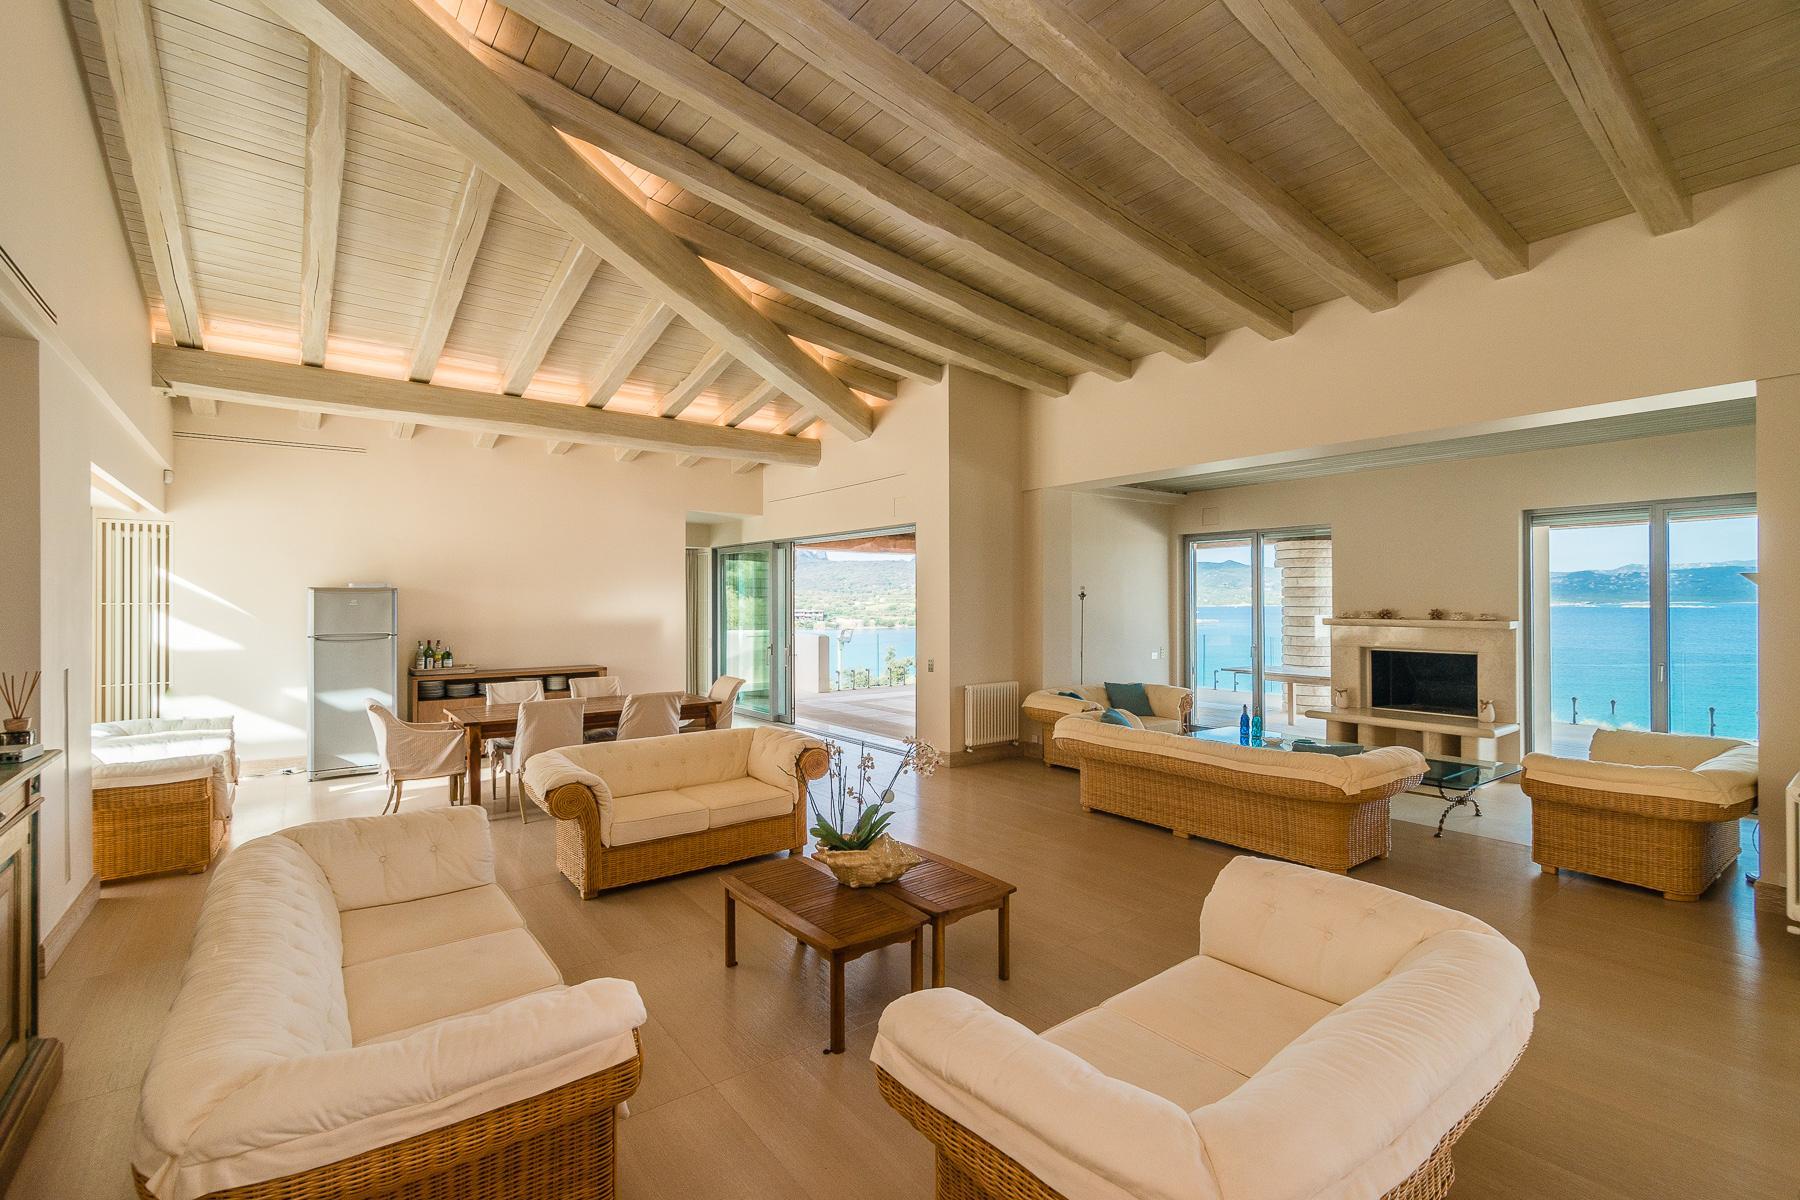 Villa unique en bord de mer sur la côte d'Émeraude - 8